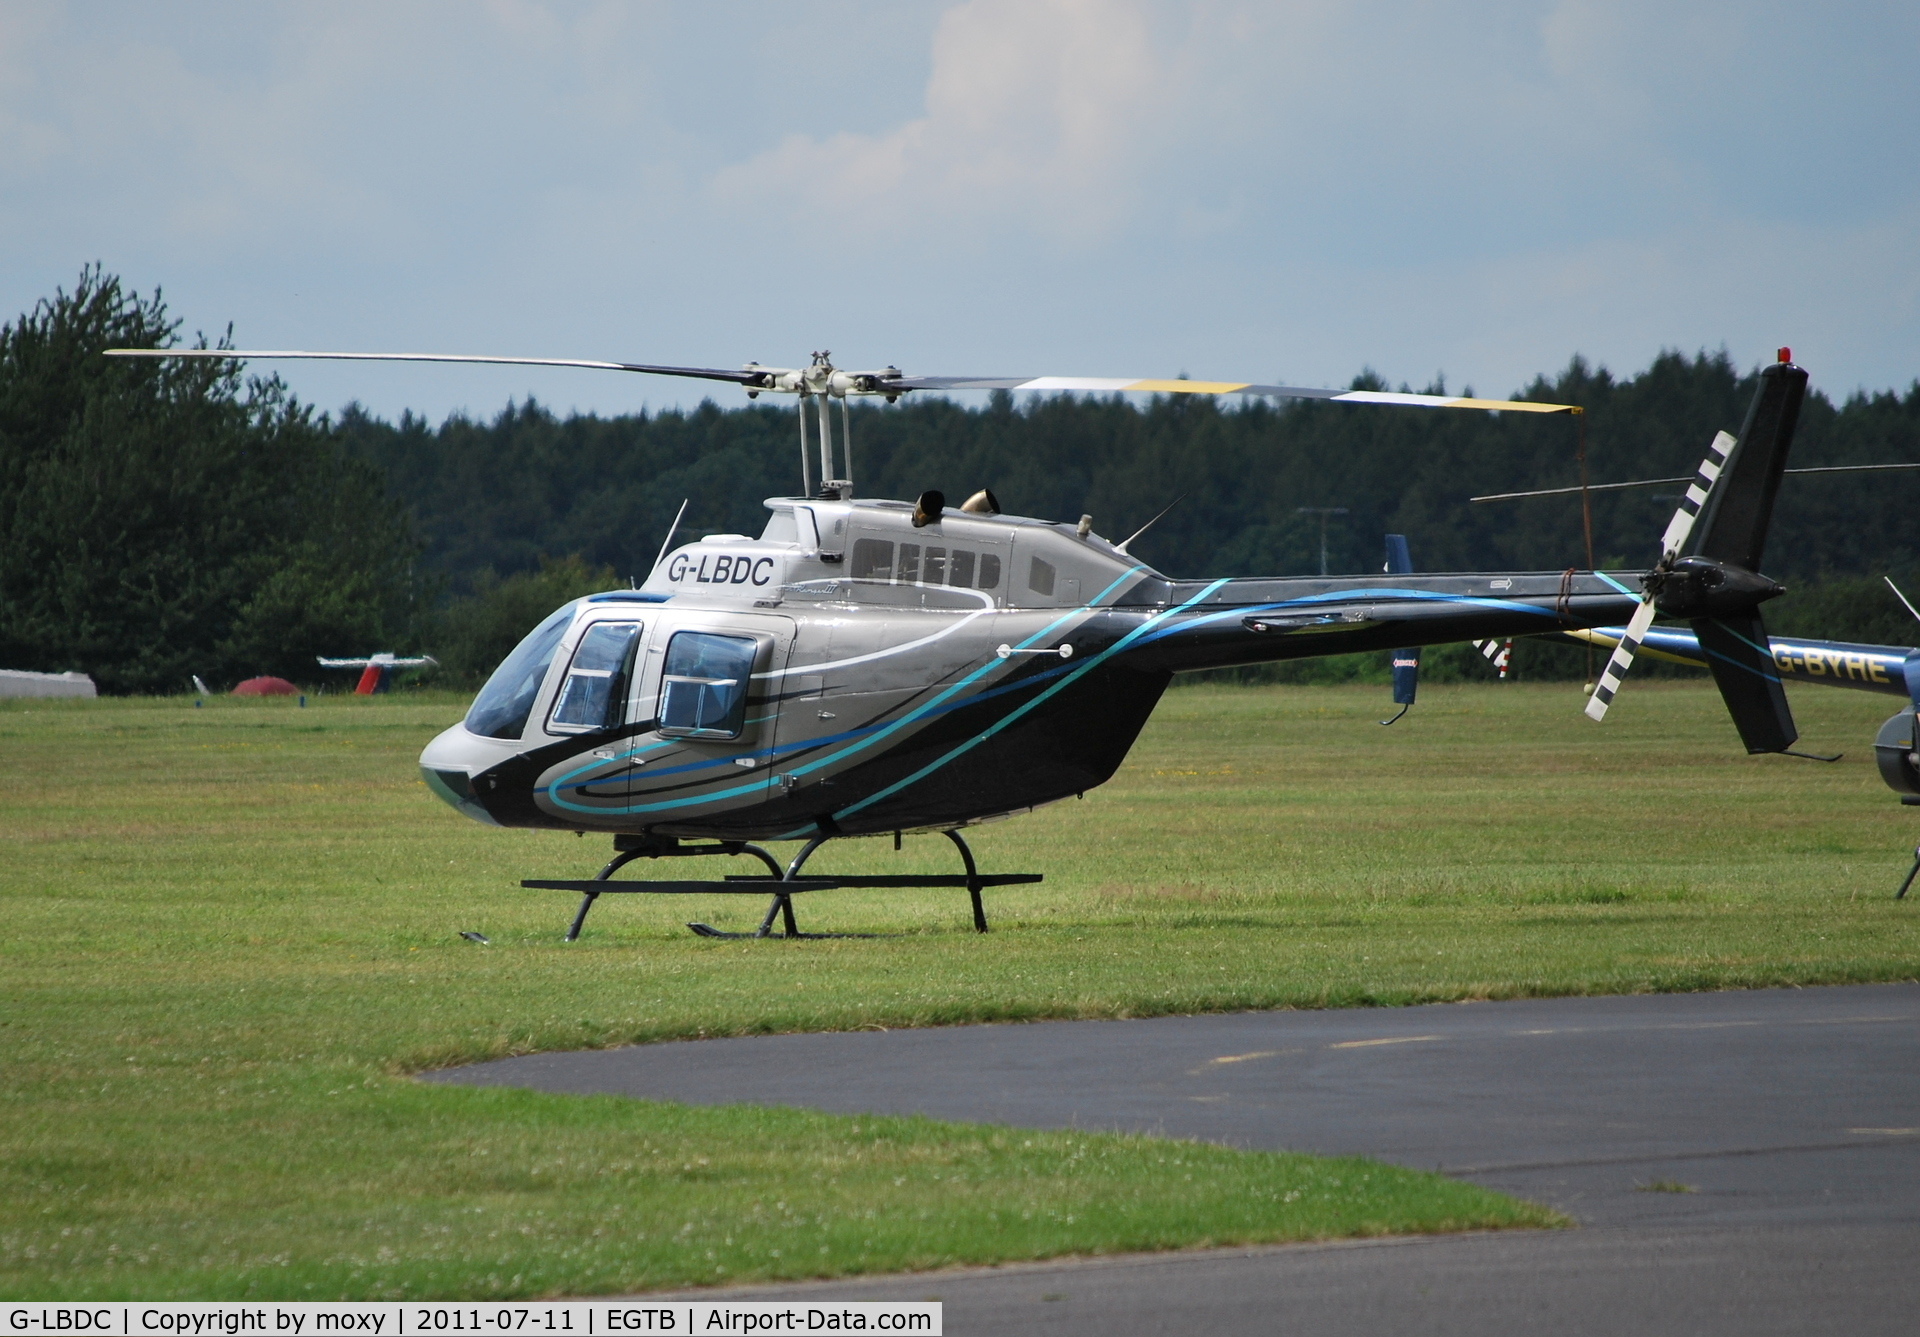 G-LBDC, 1984 Bell 206B JetRanger III C/N 3806, Bell 206B Jet Ranger III at Wycombe Air Park. Ex N206GF